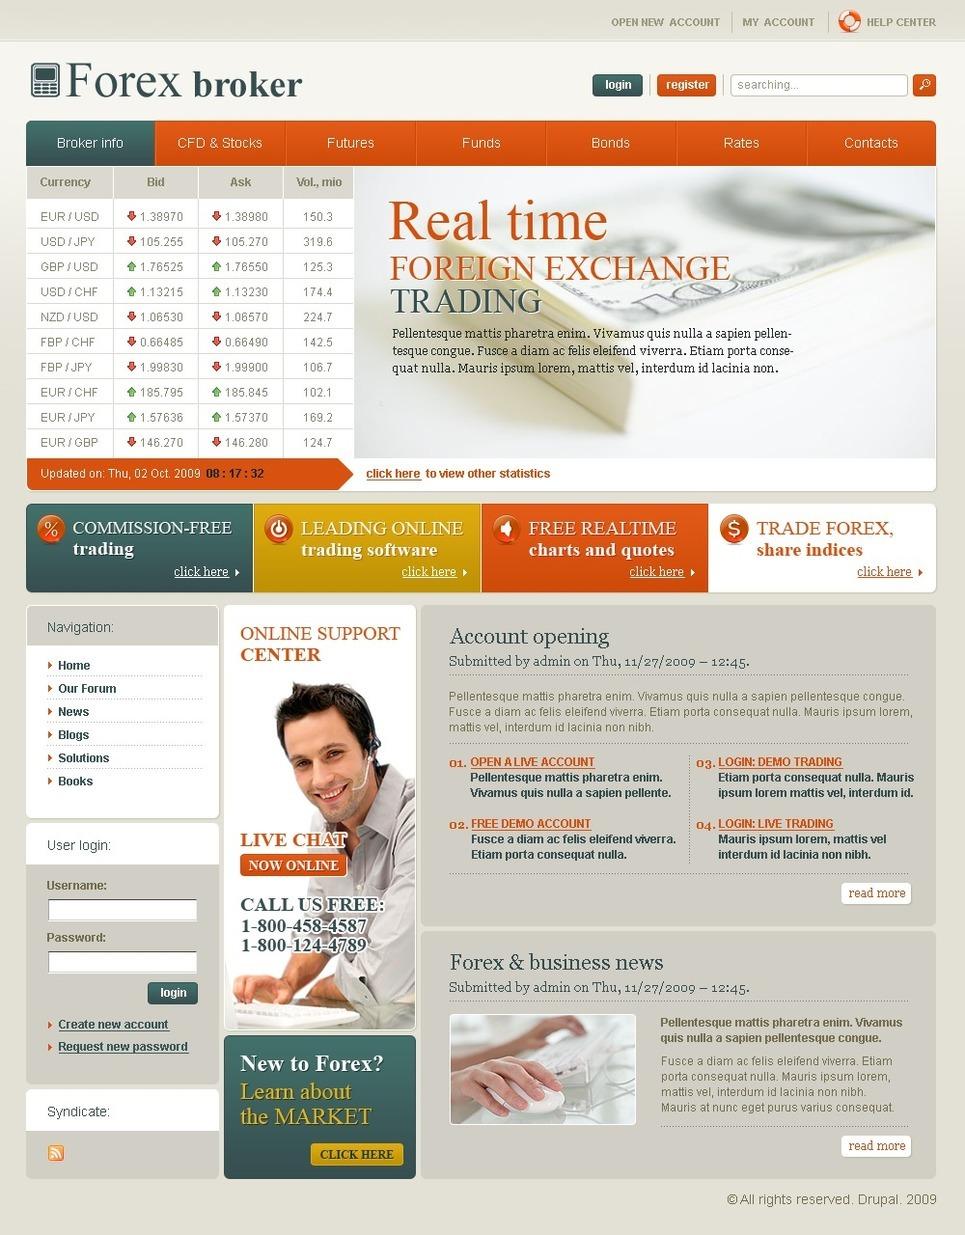 Investment Company PSD Template New Screenshots BIG